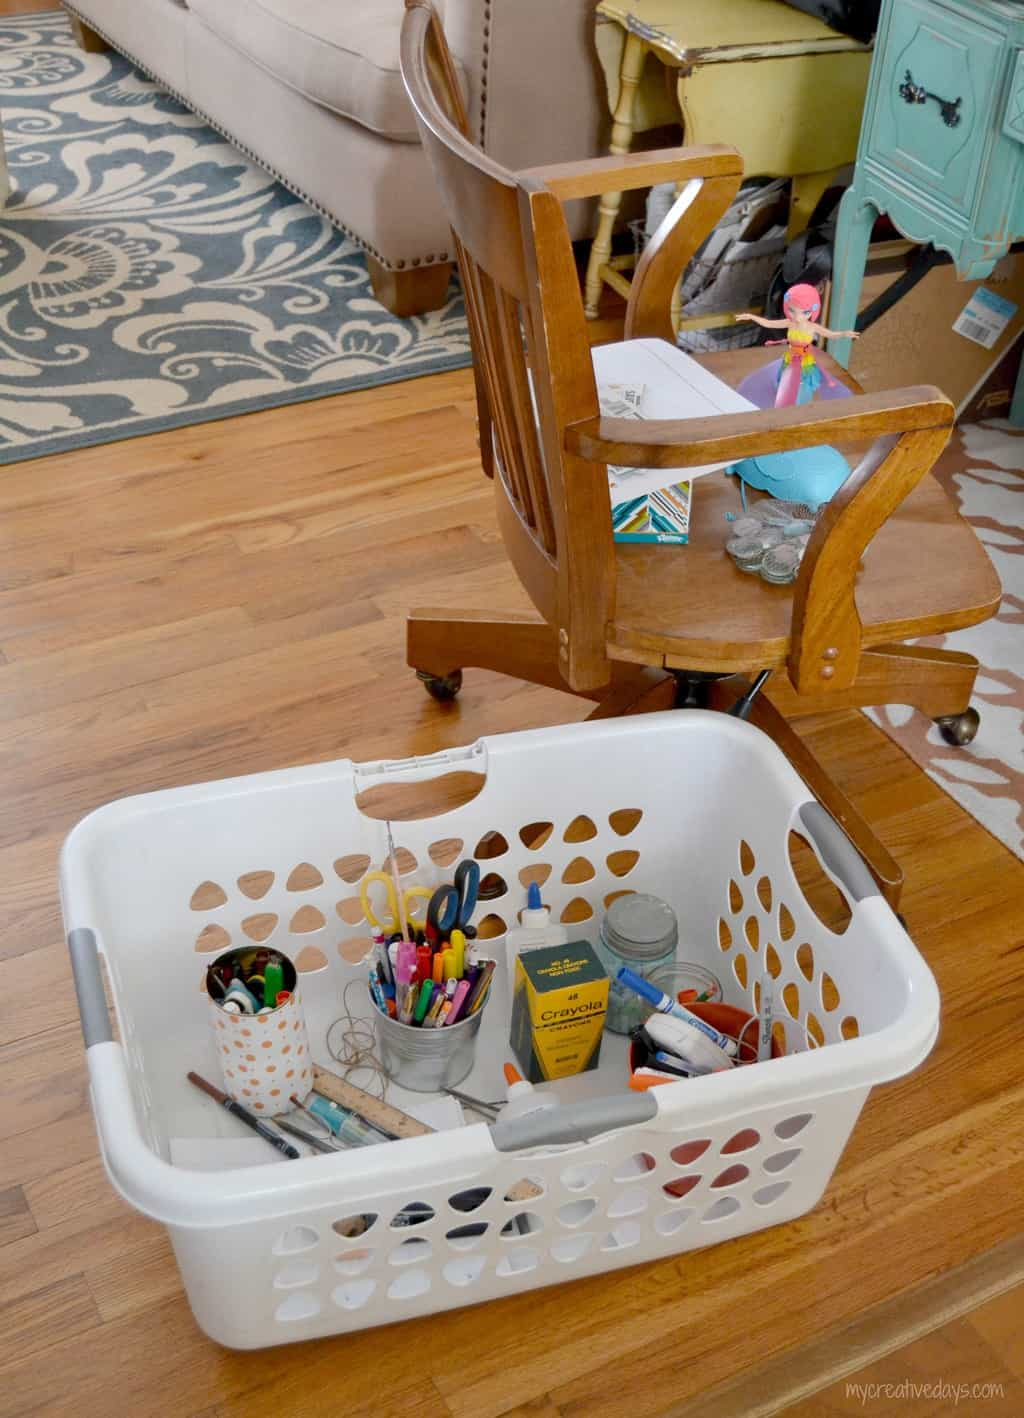 Behind The Scenes Of A Creative Blogger mycreativedays.com